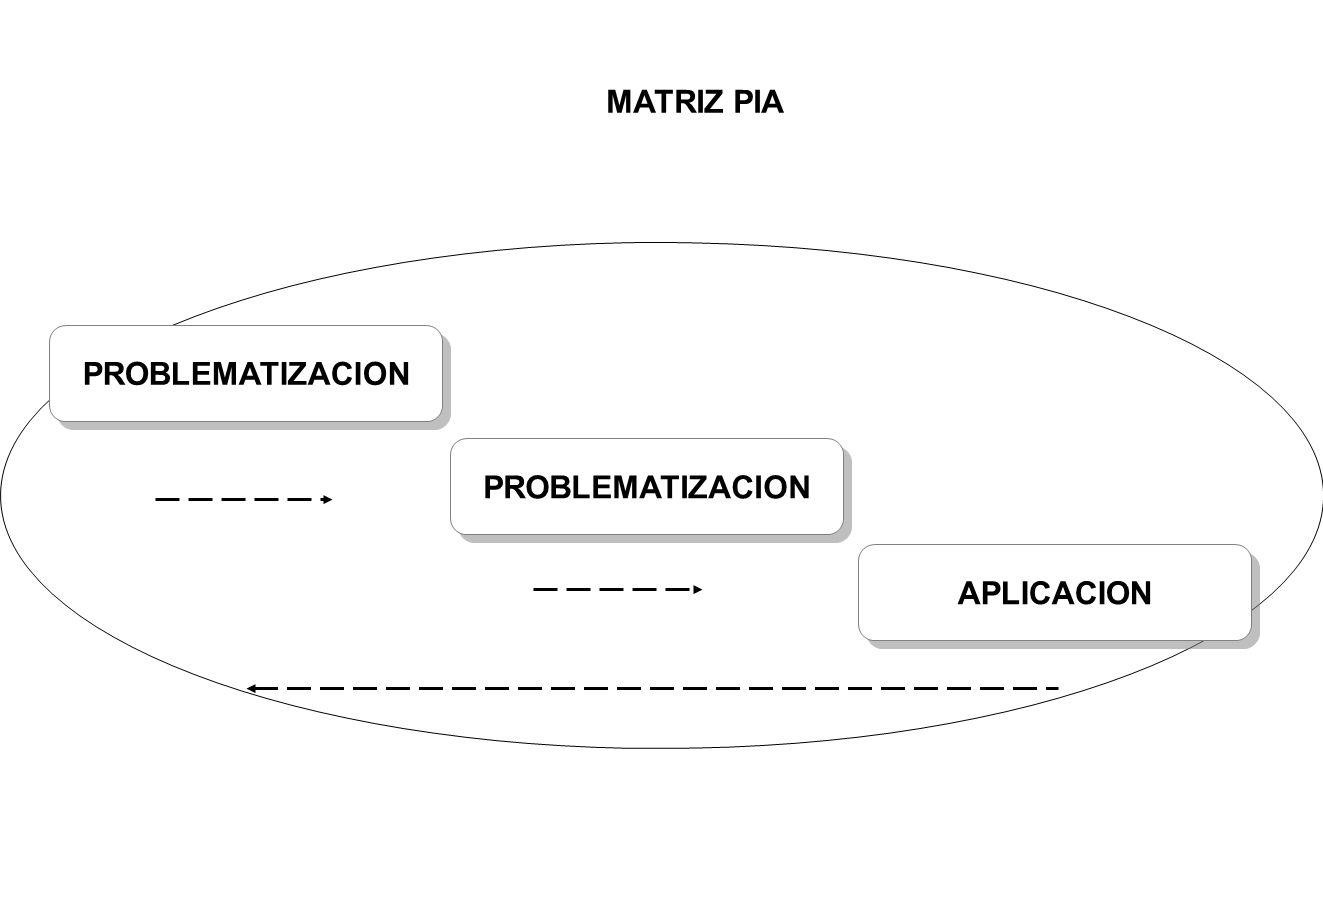 PROBLEMATIZACION APLICACION MATRIZ PIA